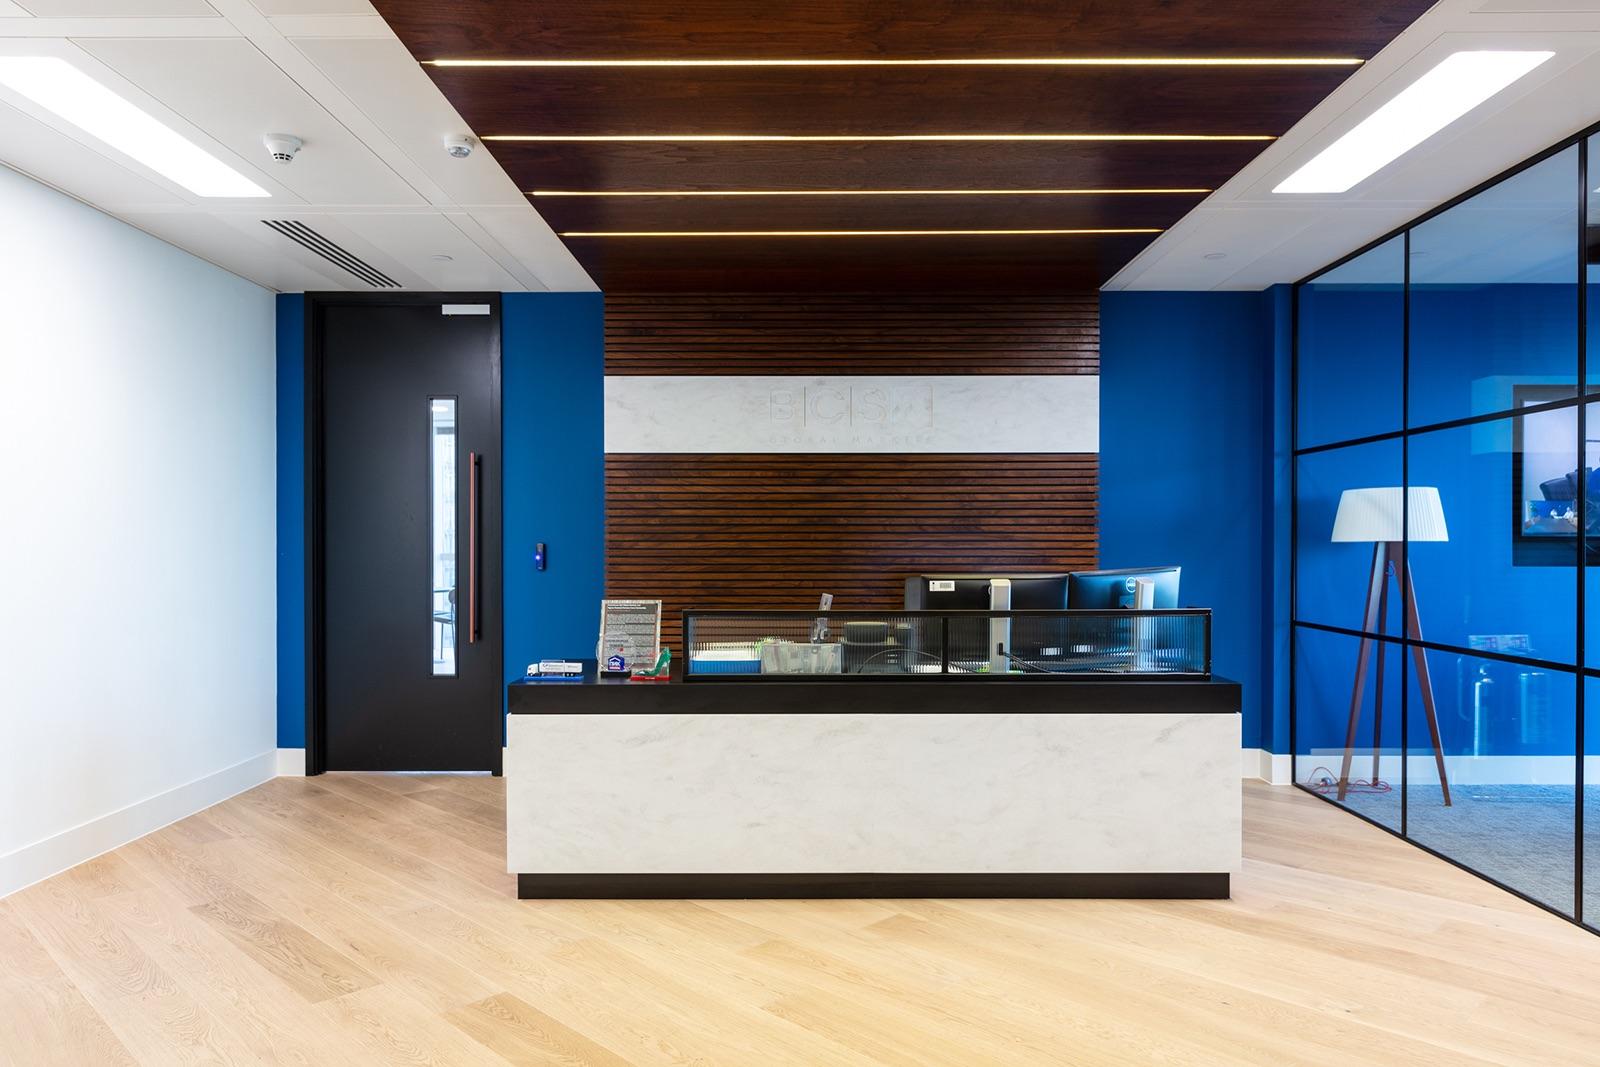 bcs-global-office-london-1